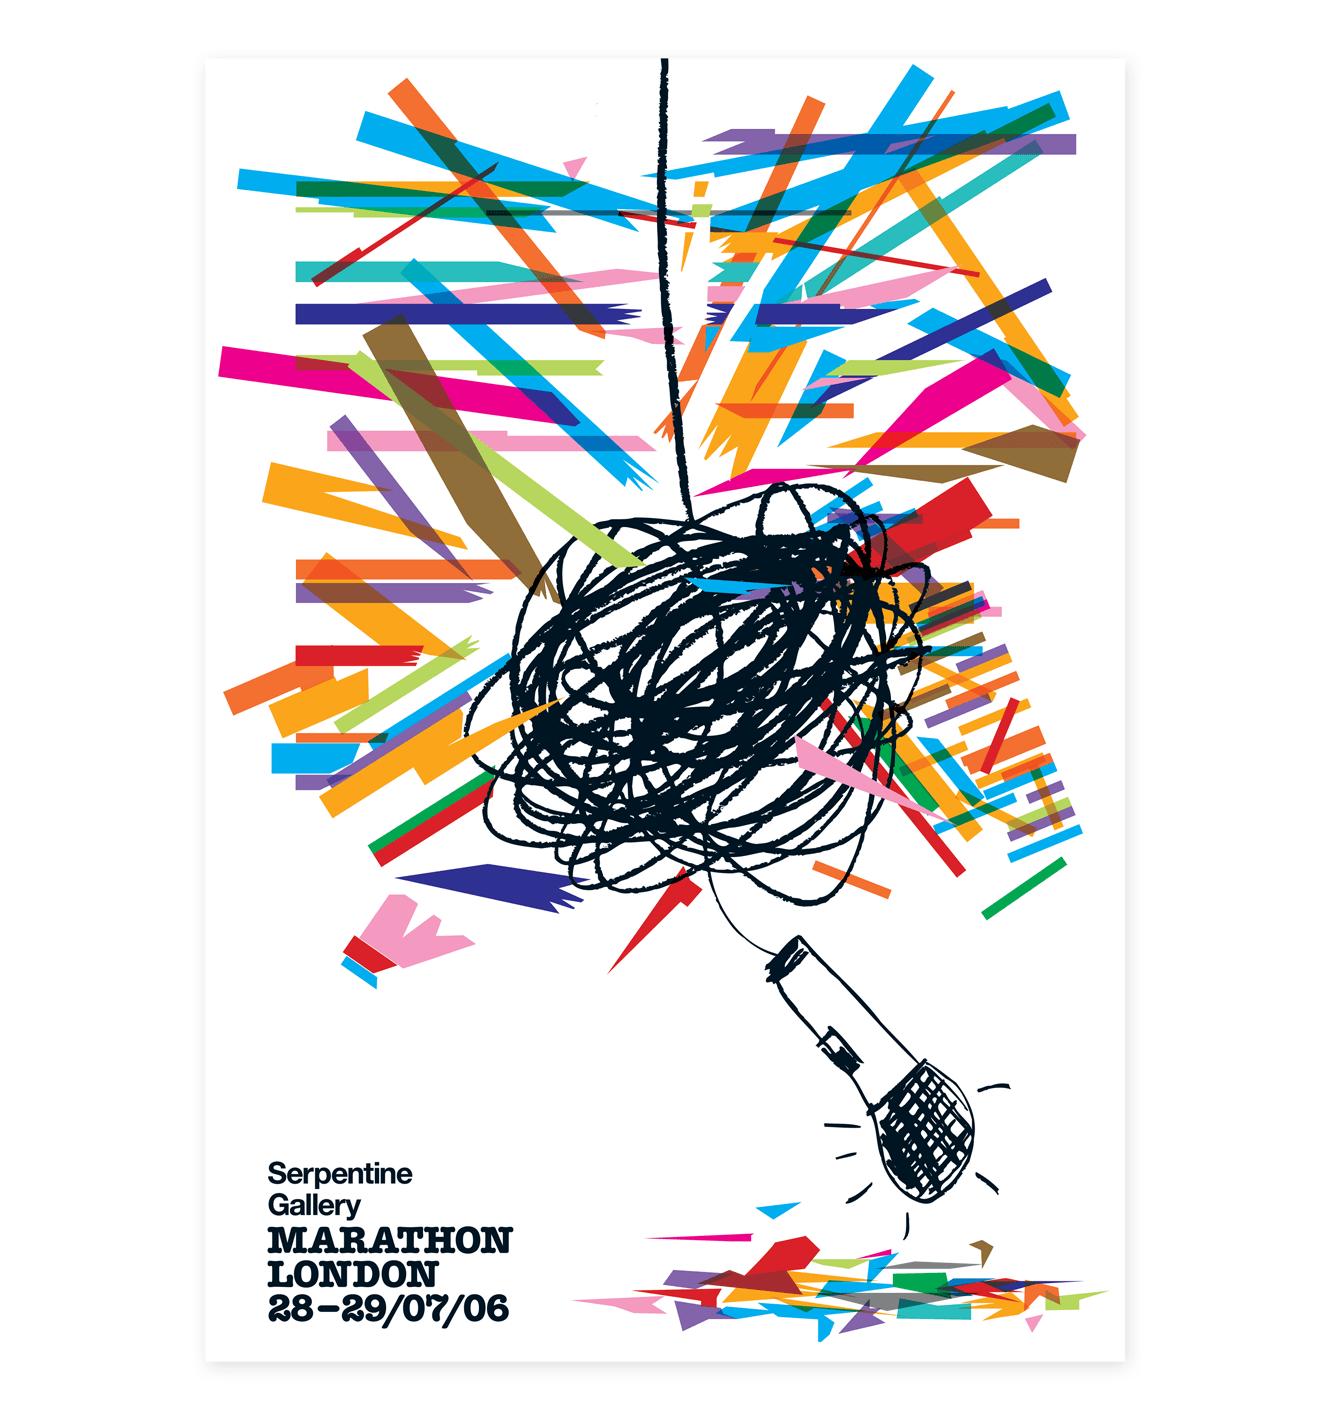 Serpentine Galleries Poster Designed By &&& Creative